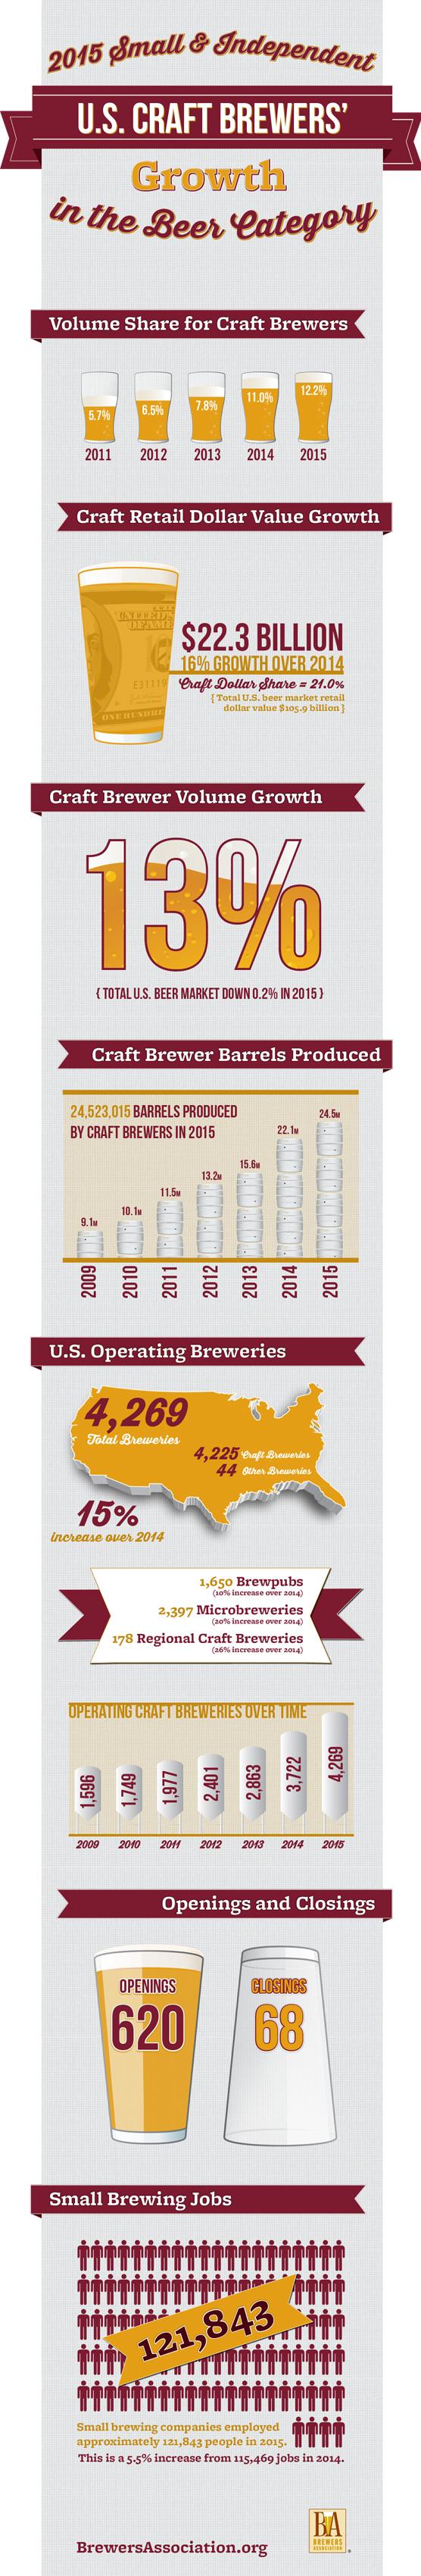 U s craft beer industry soaks up growth in 2015 for Craft beer industry statistics